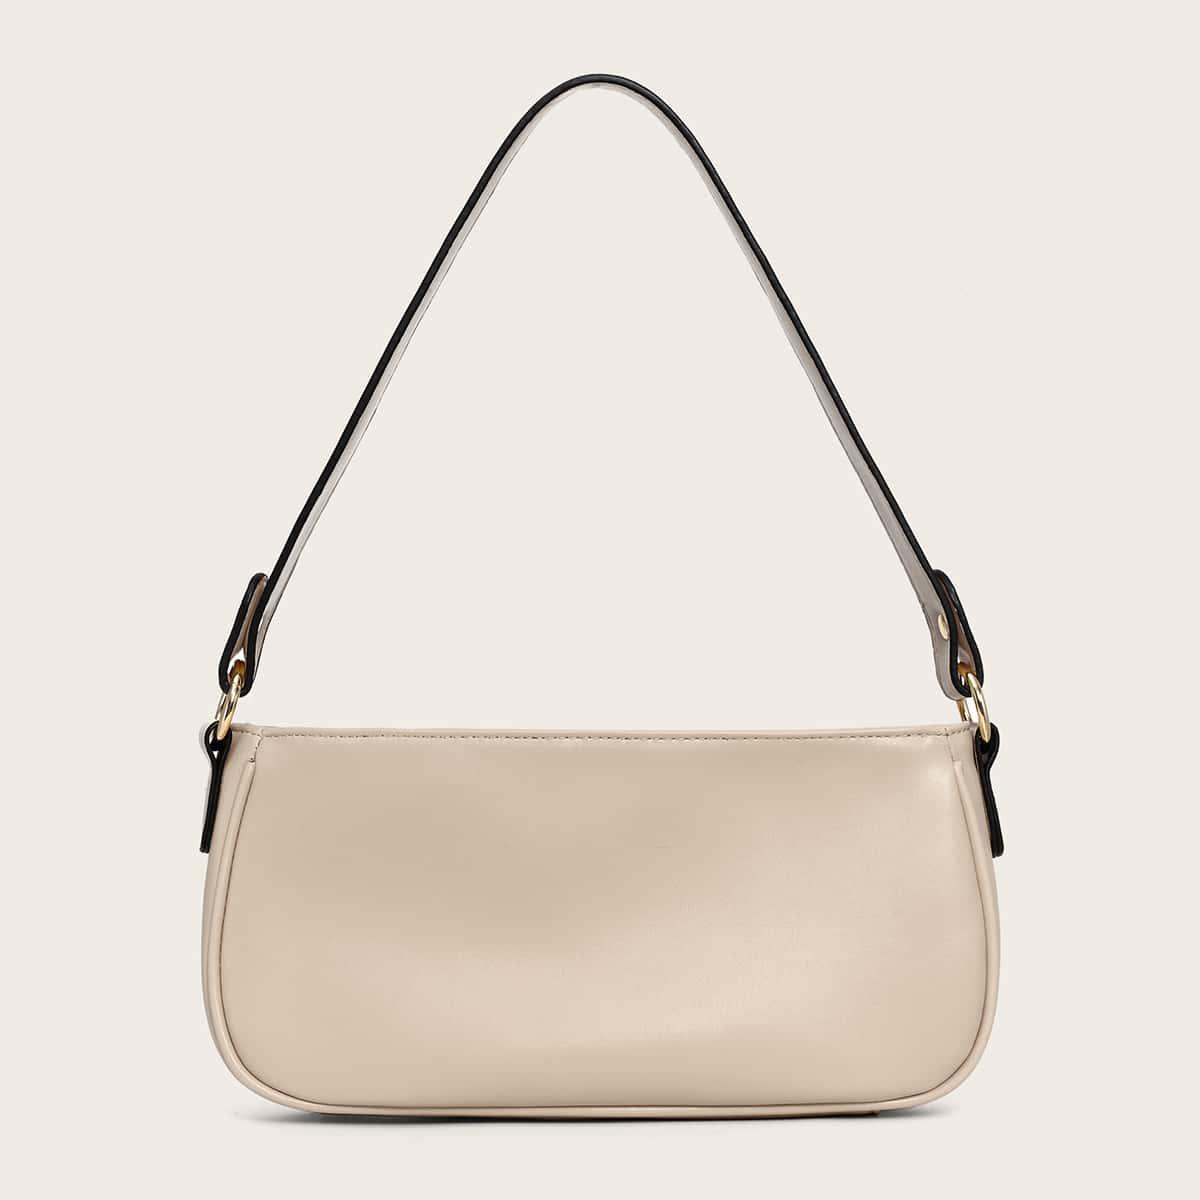 Минималистичная сумка-багет